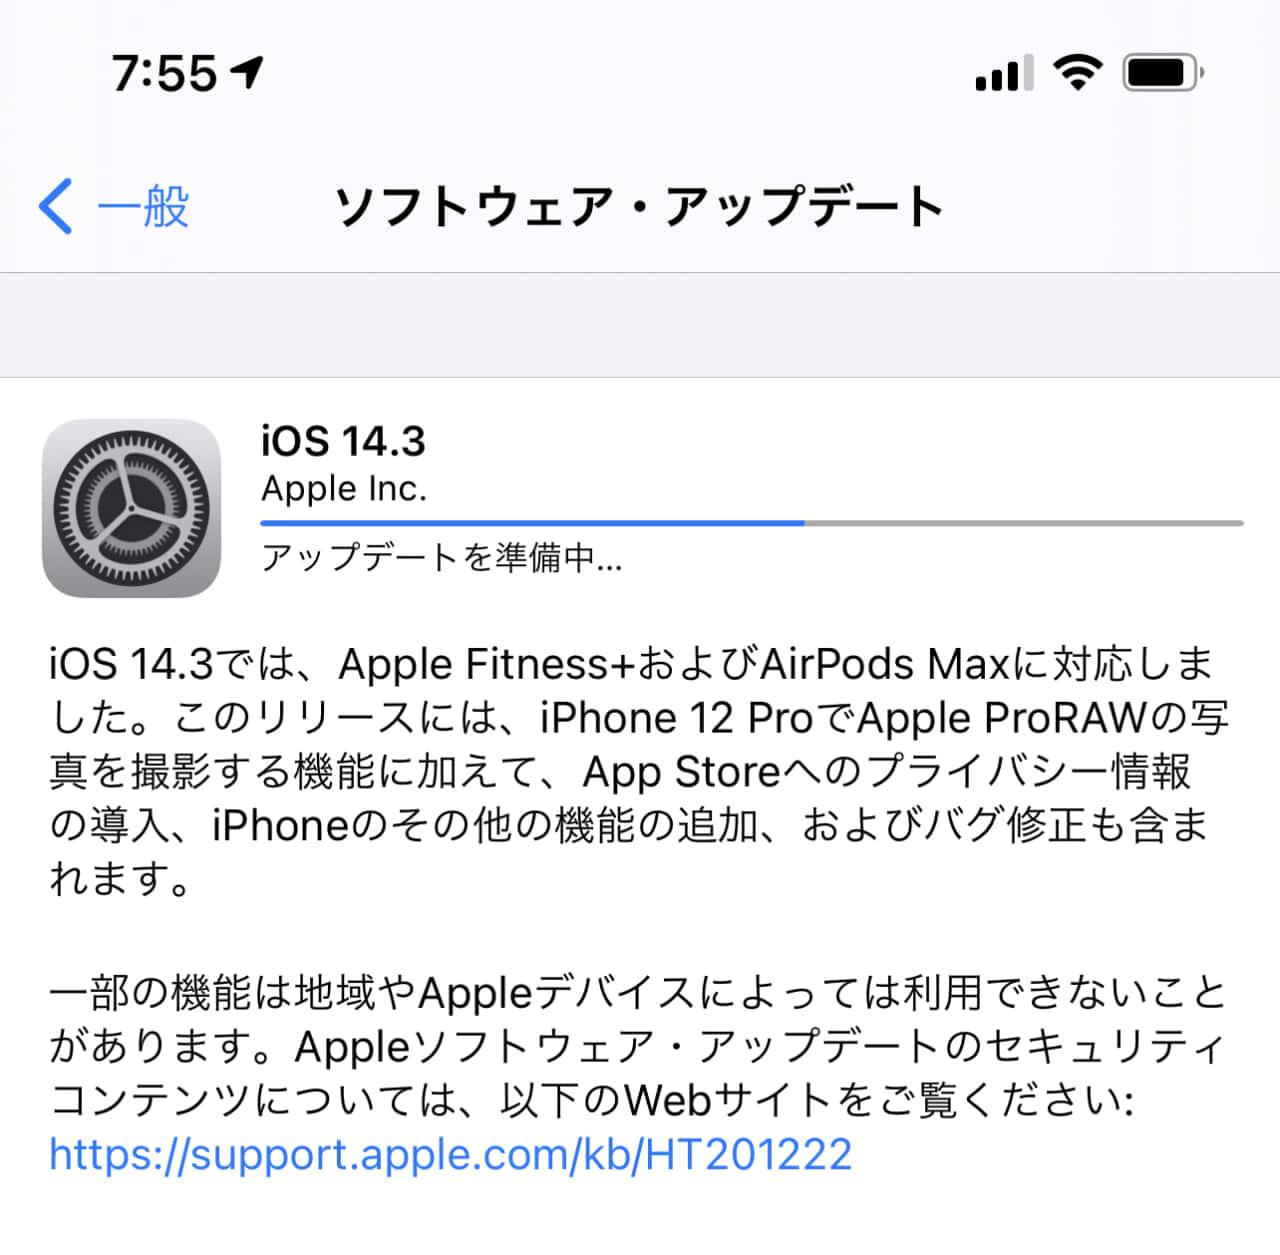 FGOが起動するか試す。Apple iOS14.3公開AirPods Max対応 Apple ProRAW撮影